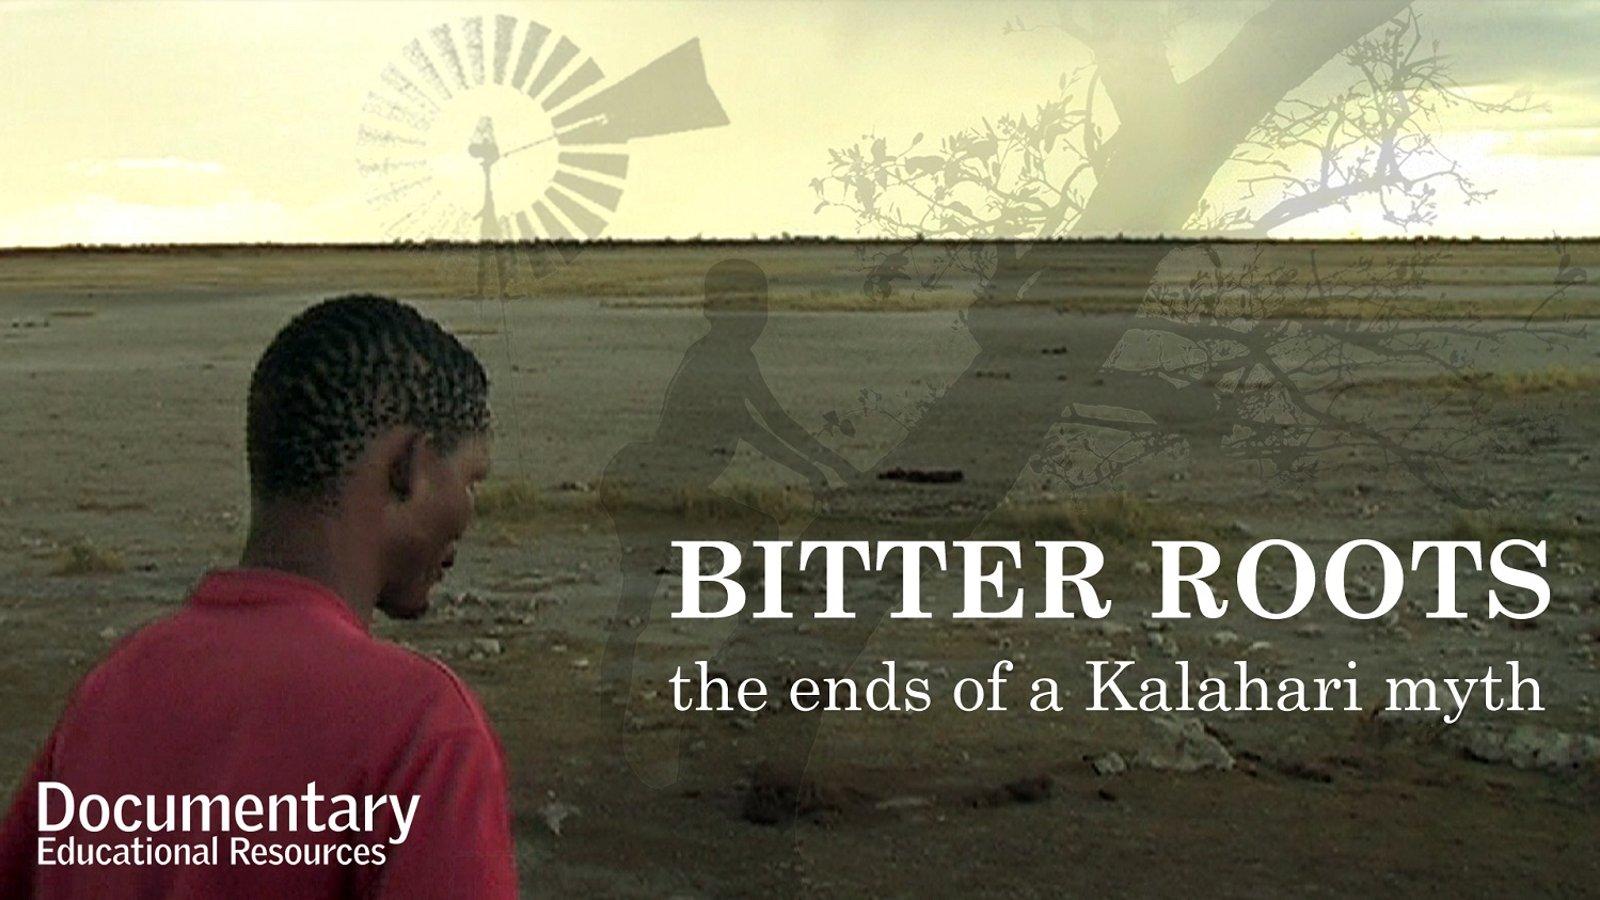 Bitter Roots - The Ends of a Kalahari Myth